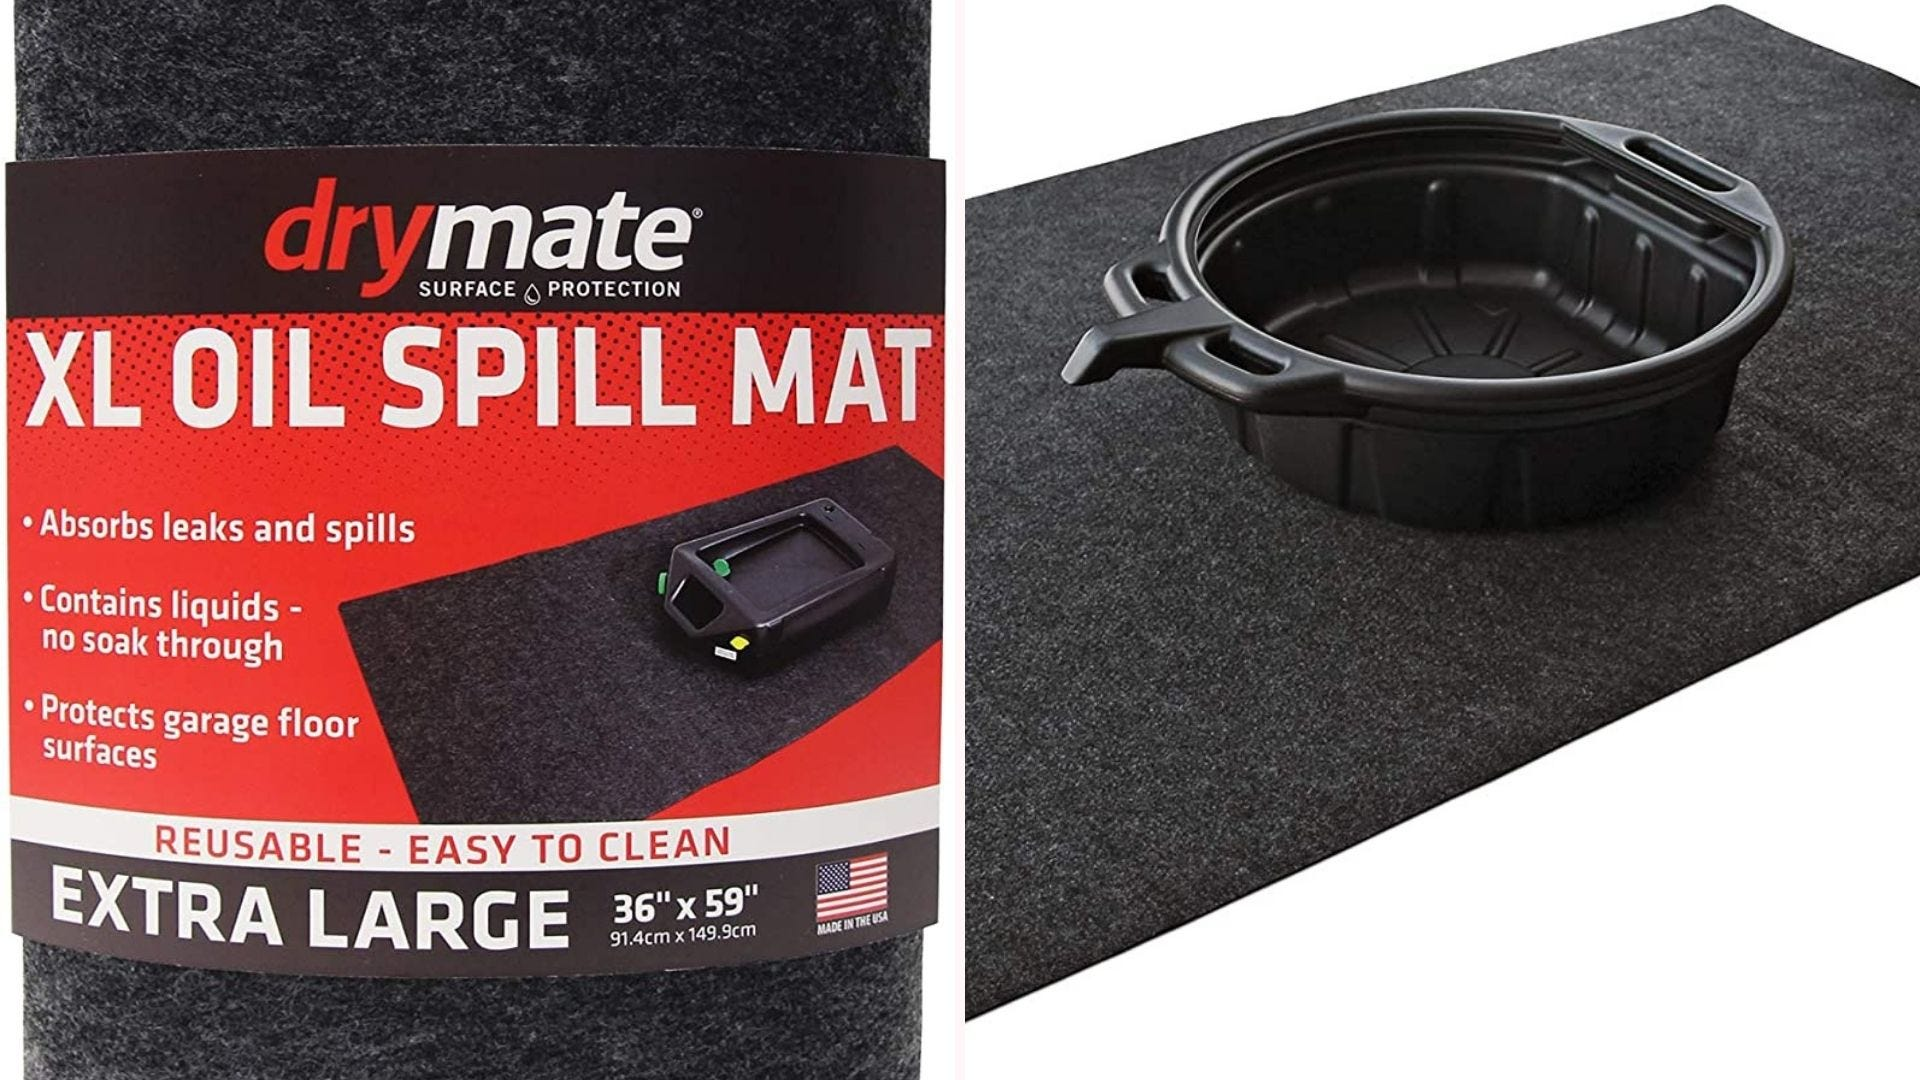 A garage floor mat with a raised catcher for oil spills